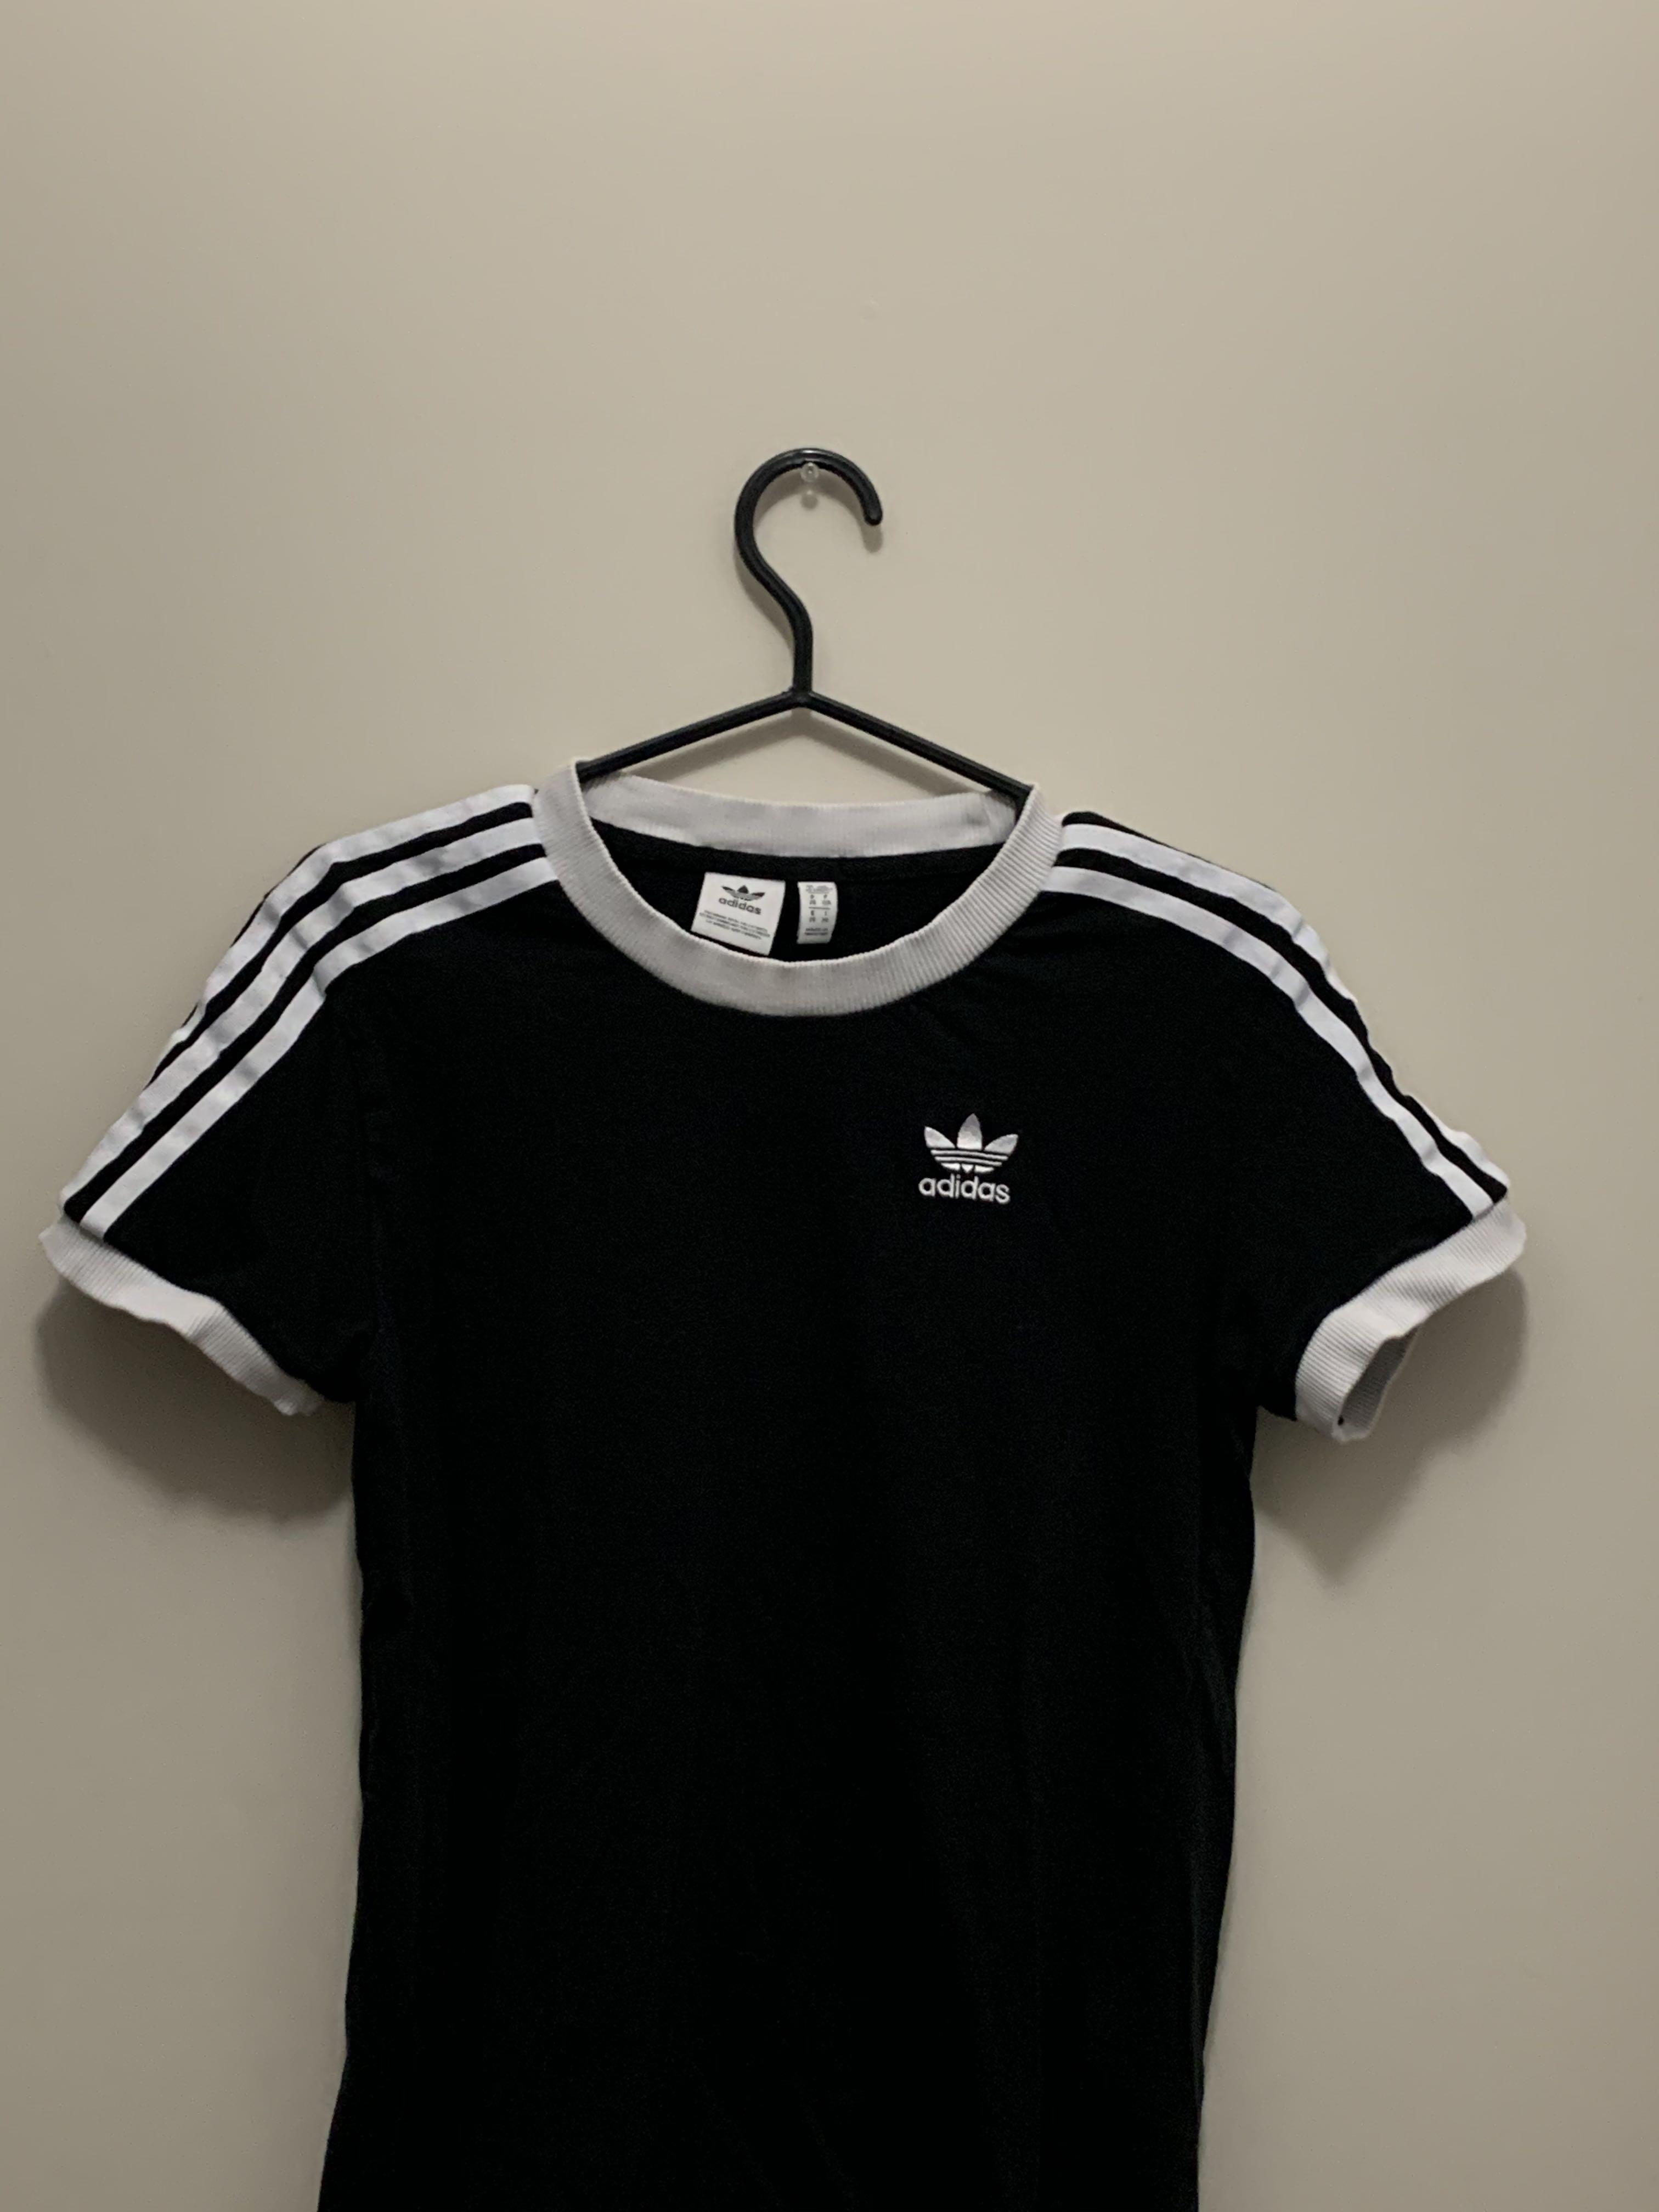 BRAND NEW Adidas Tee